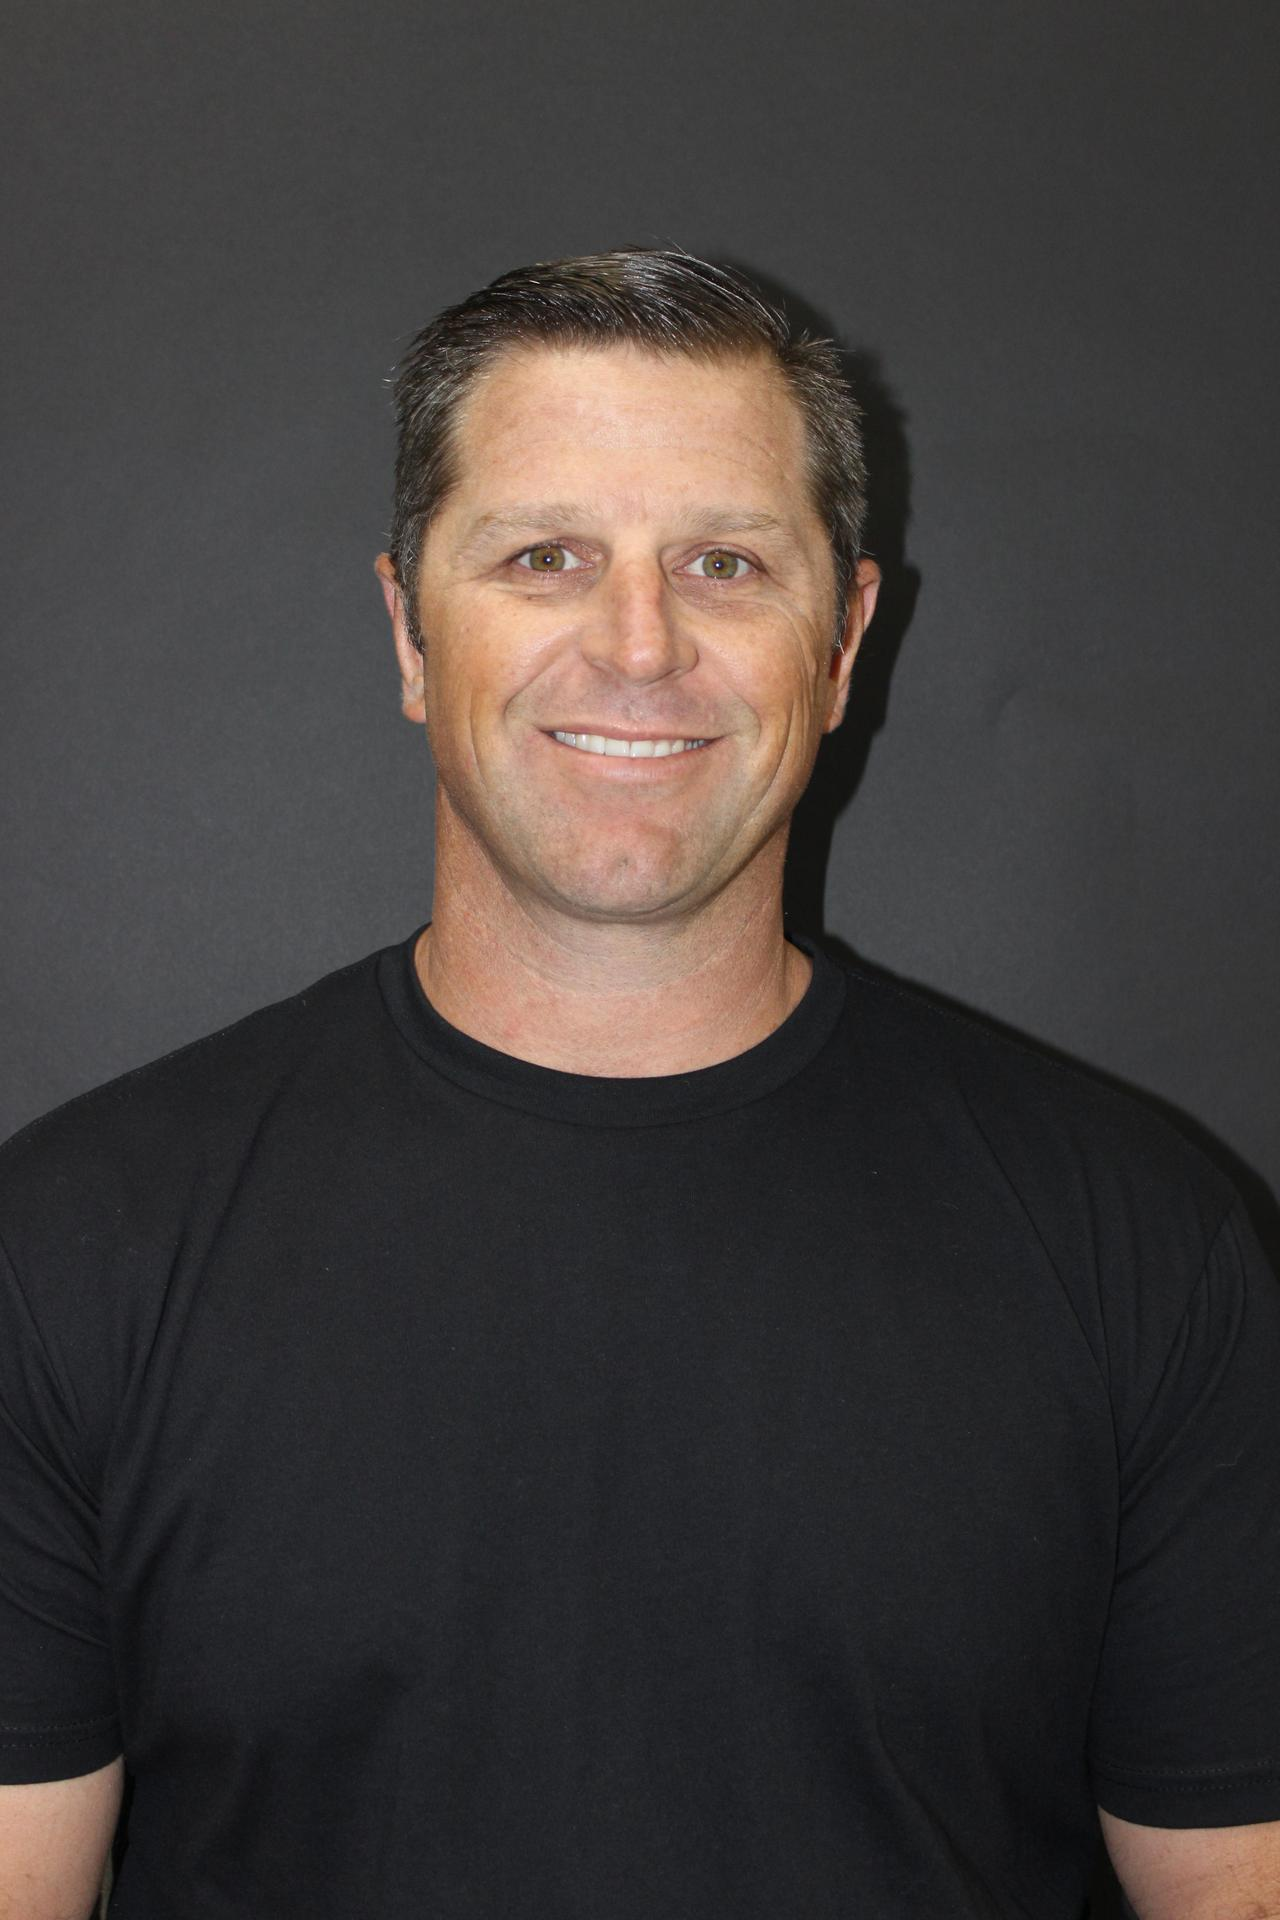 Chad Englert